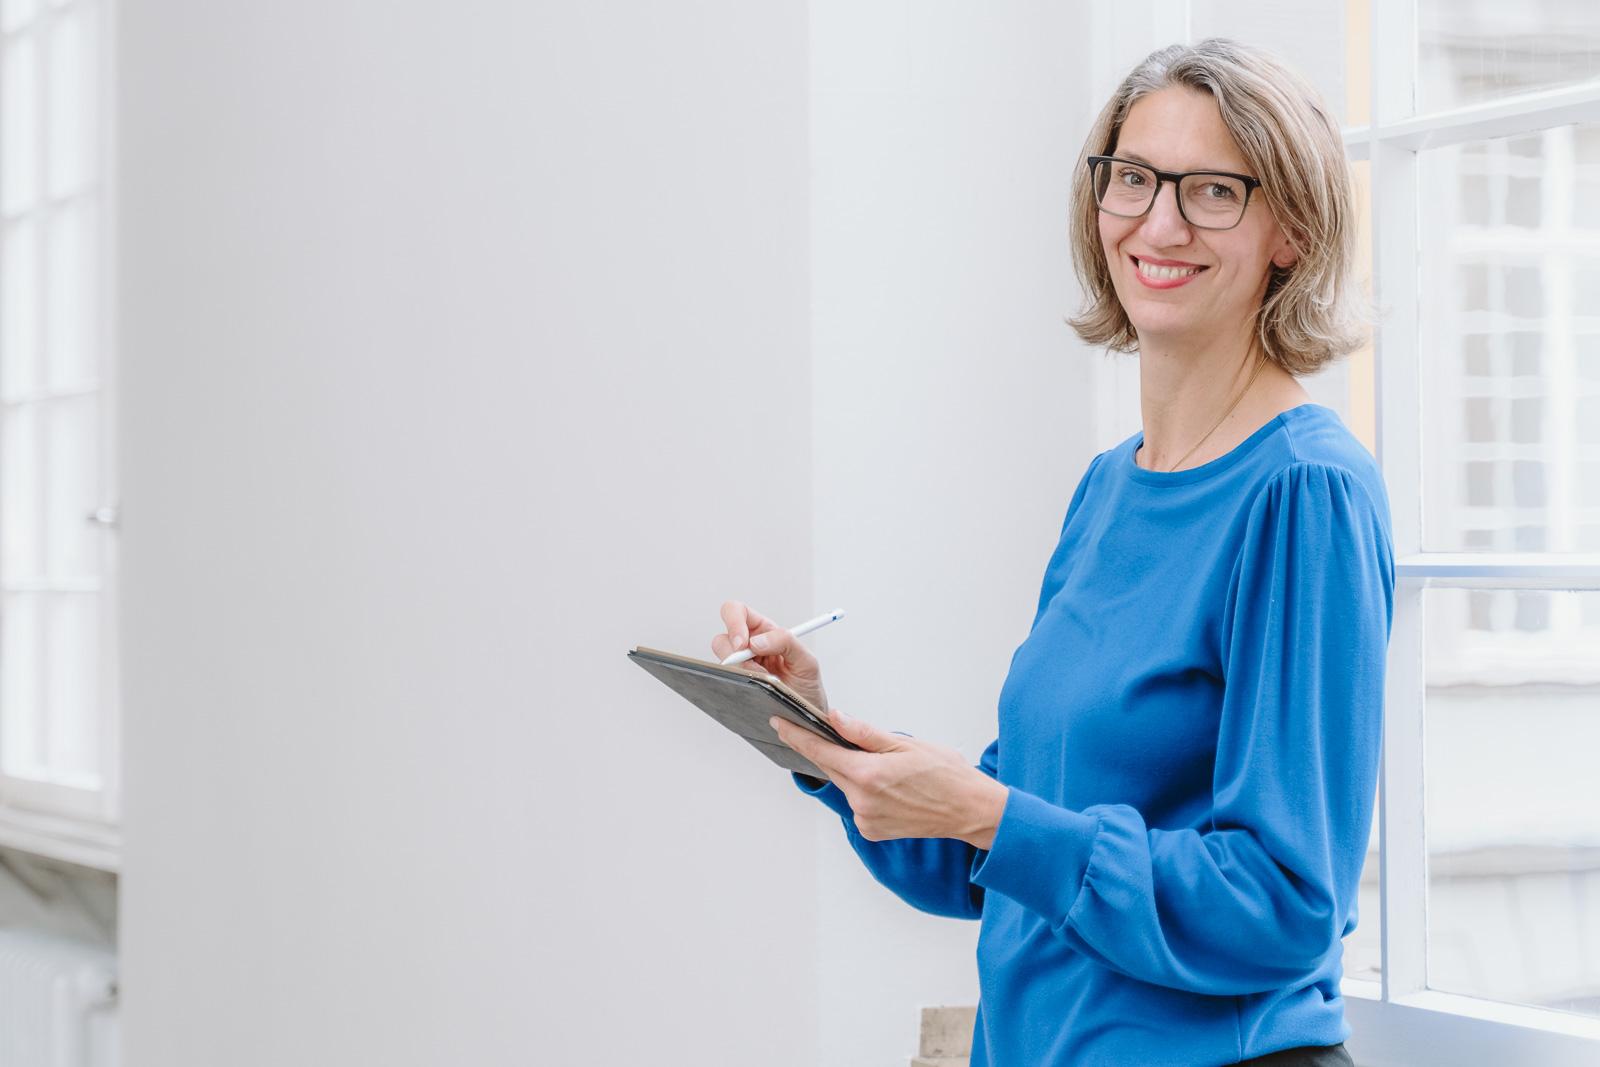 Frau arbeitet am ipad - Businessporträts Fotograf Bonn